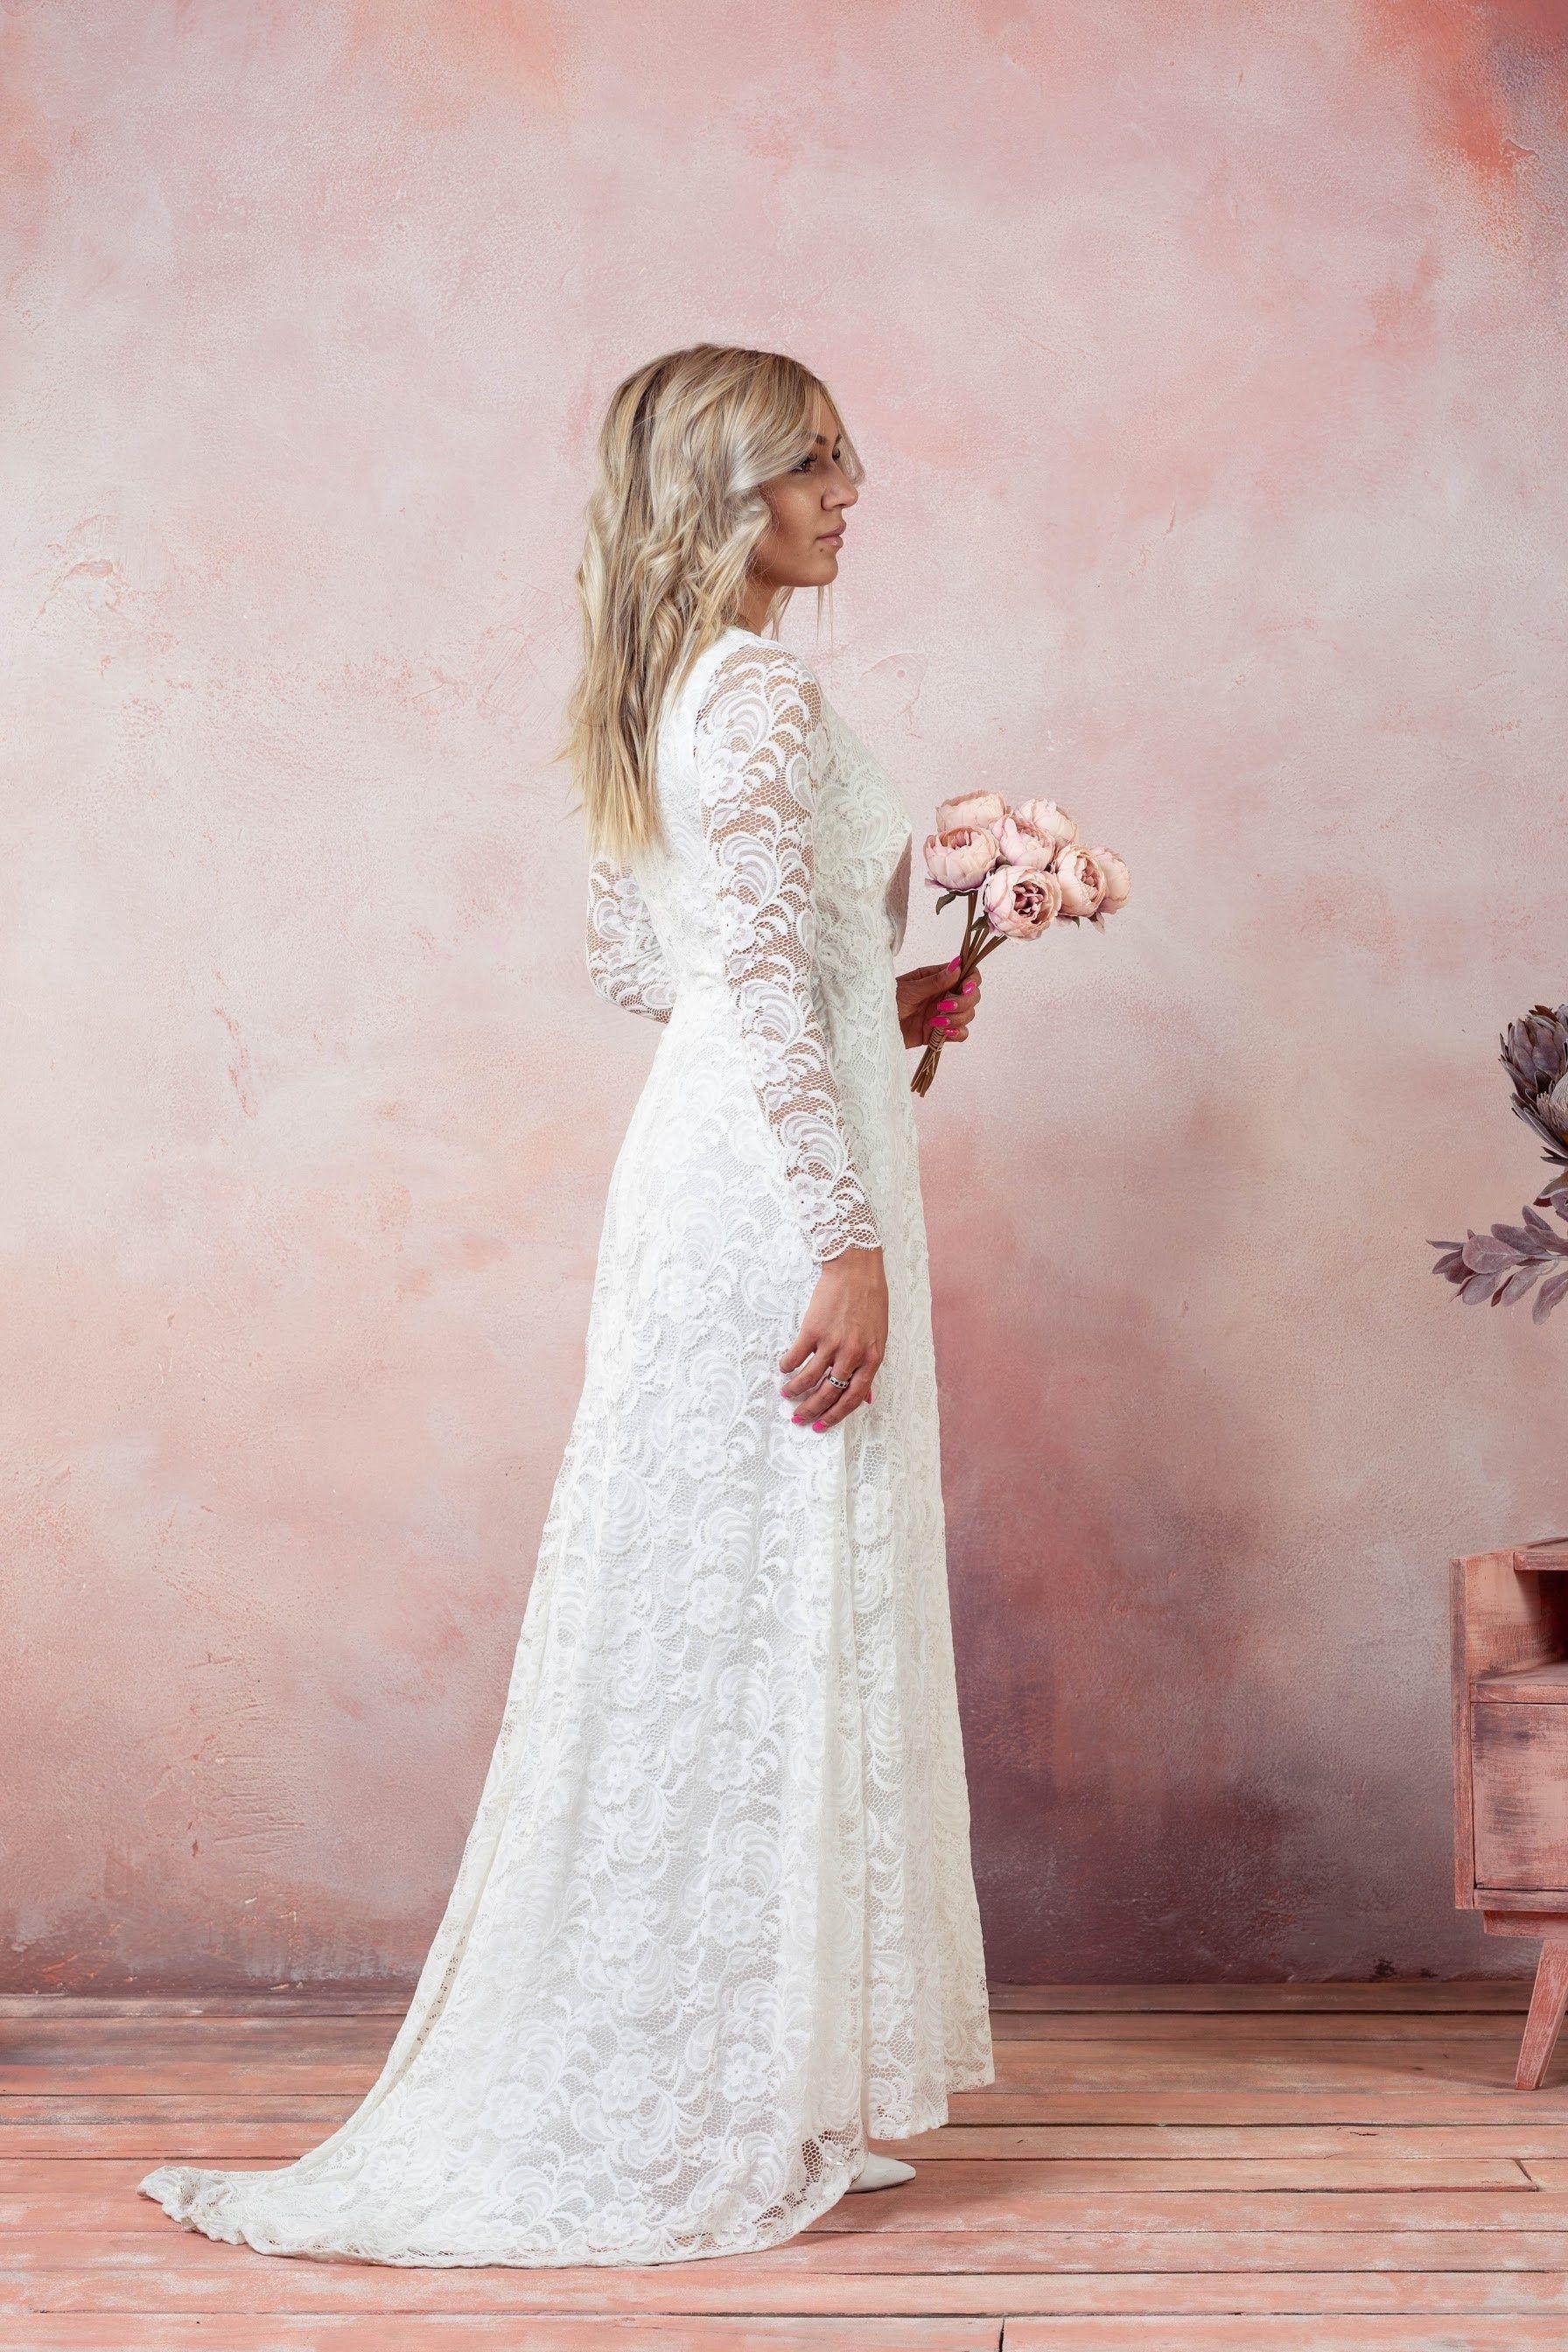 Romantic Wedding Dress Beach Boho Lace Dress Bohemian Wedding Gown Long Sleeve Wedding Lace Dress Rustic Bridal Lace Gown In 2020 Lace Dress Boho Bohemian Wedding Gown Wedding Dresses Unique